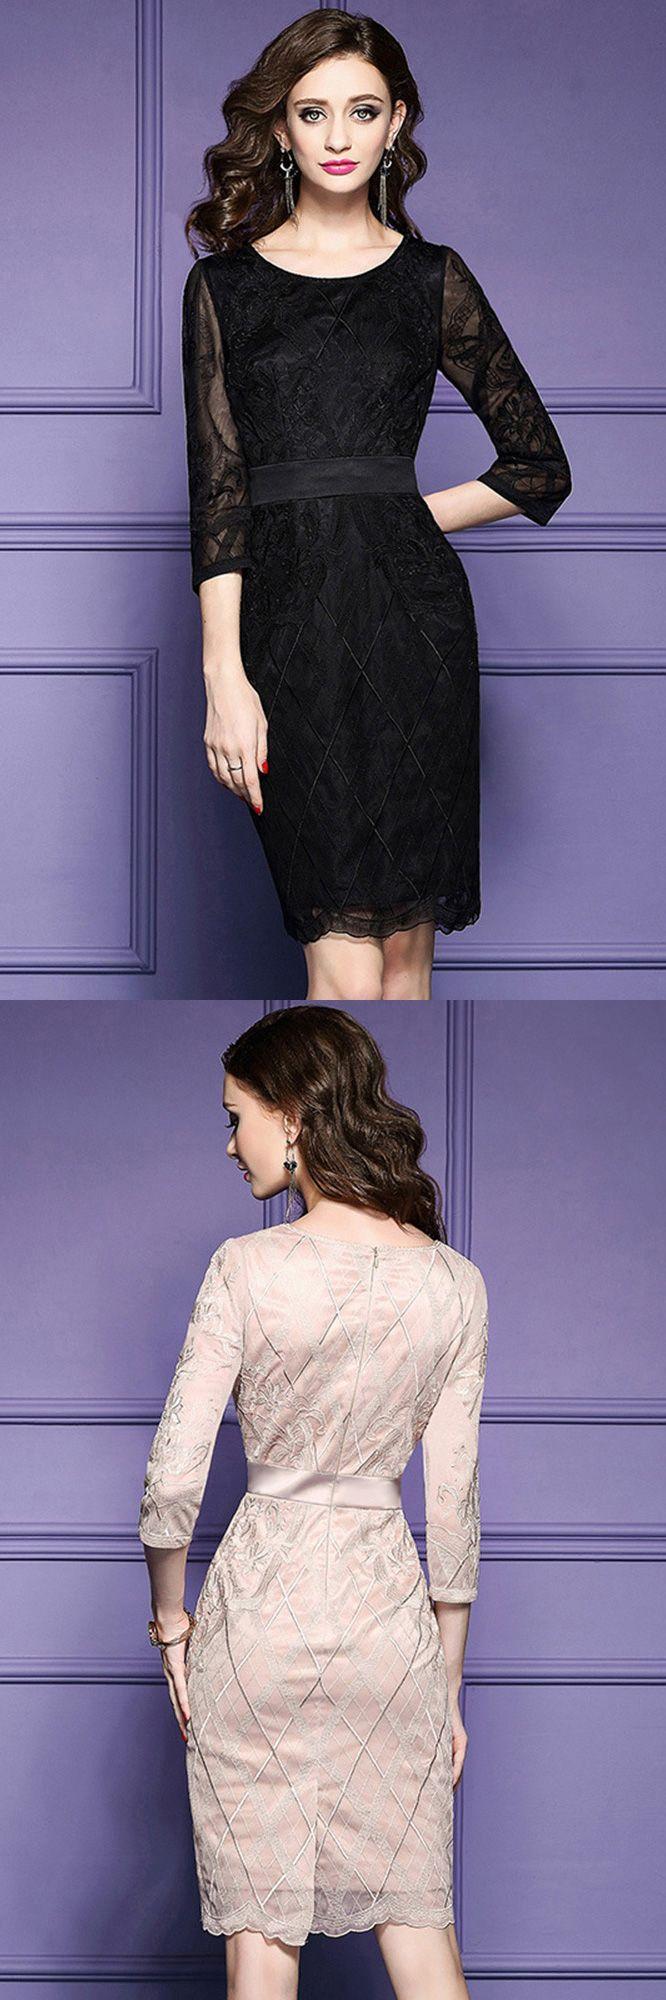 Wedding guest dress ideas  Luxe Black Lace Sleeve Short Wedding Guest Dress Black Tie For